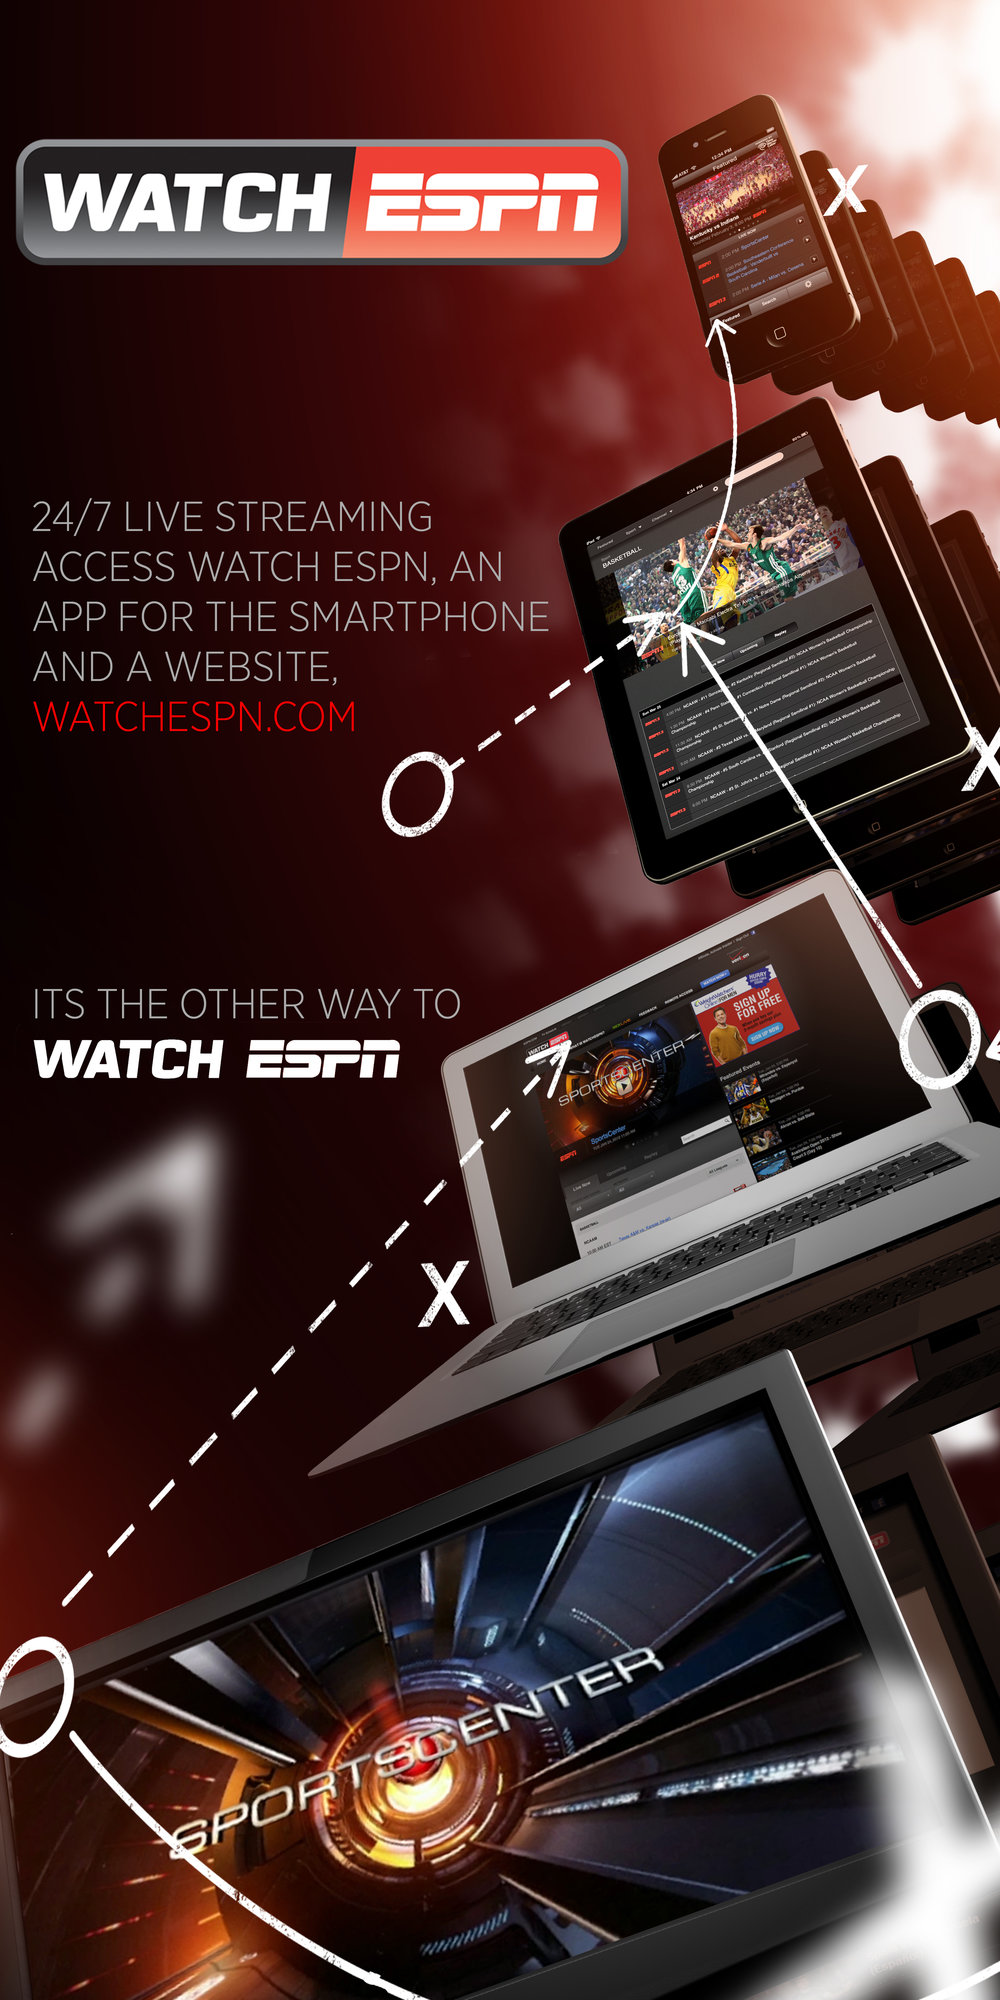 ESPN_PRINT_4.jpg